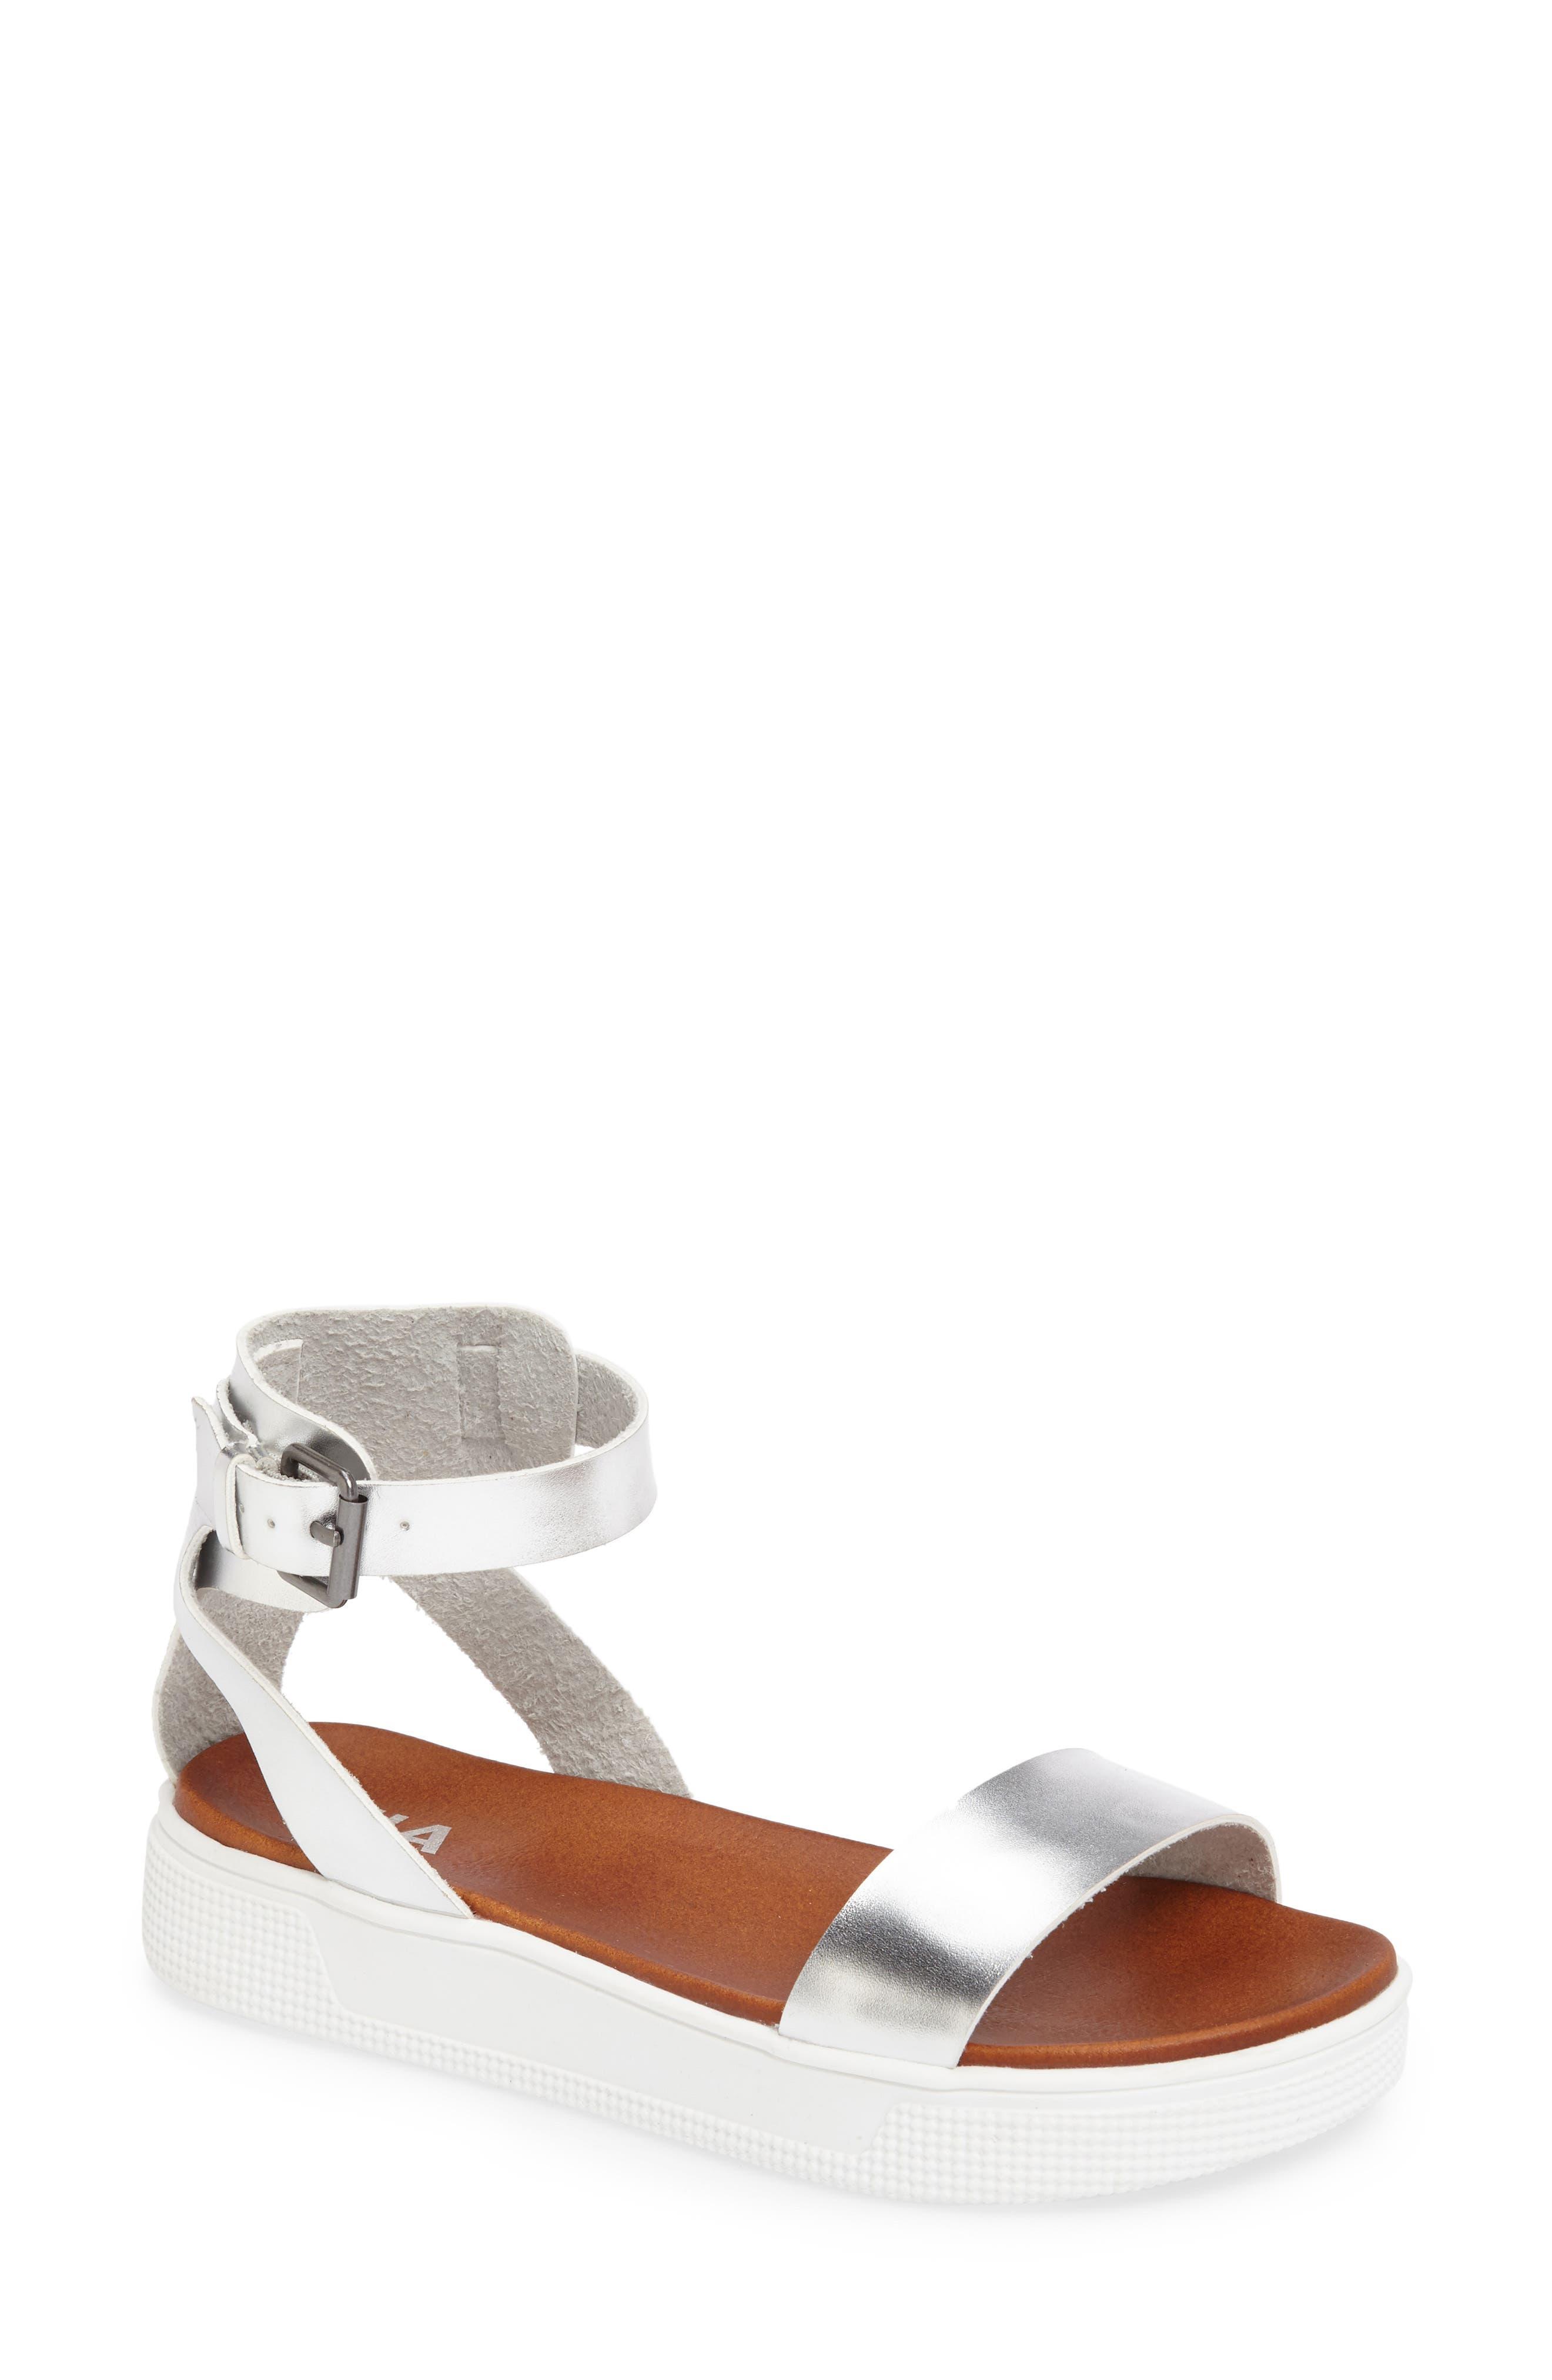 Platform Sandal,                         Main,                         color, Silver Metallic Leather